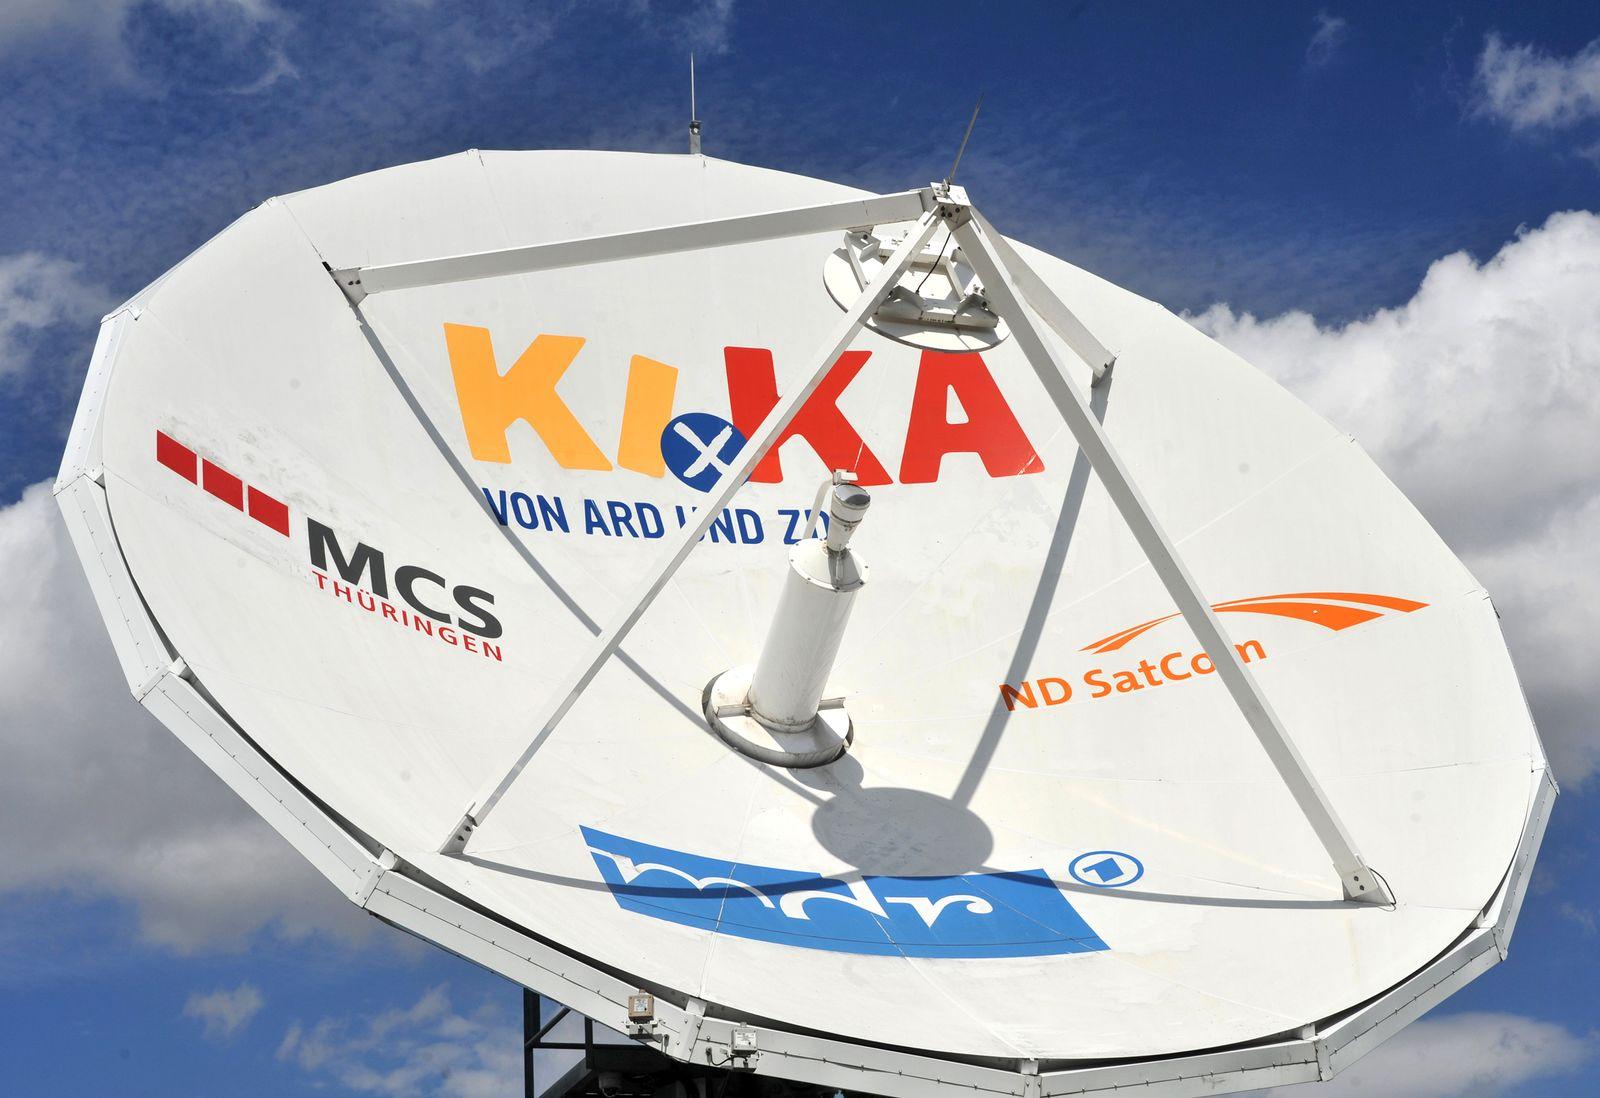 TV/ KiKa/ Kinderkanal/ Jugendkanal